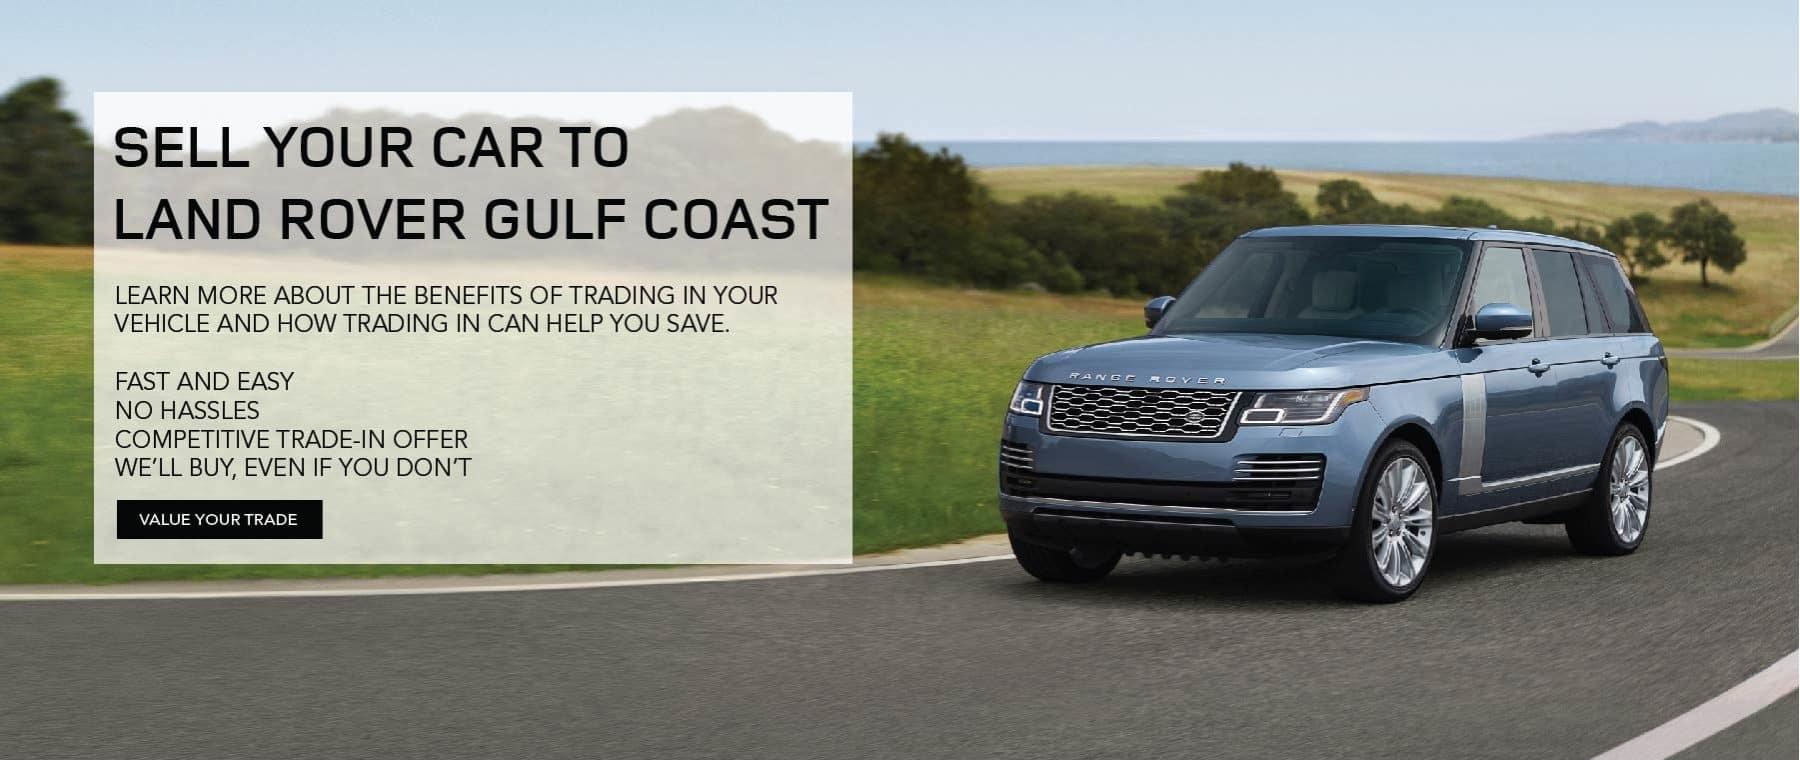 Gulf Coast_Land Rover – Value Your Trade